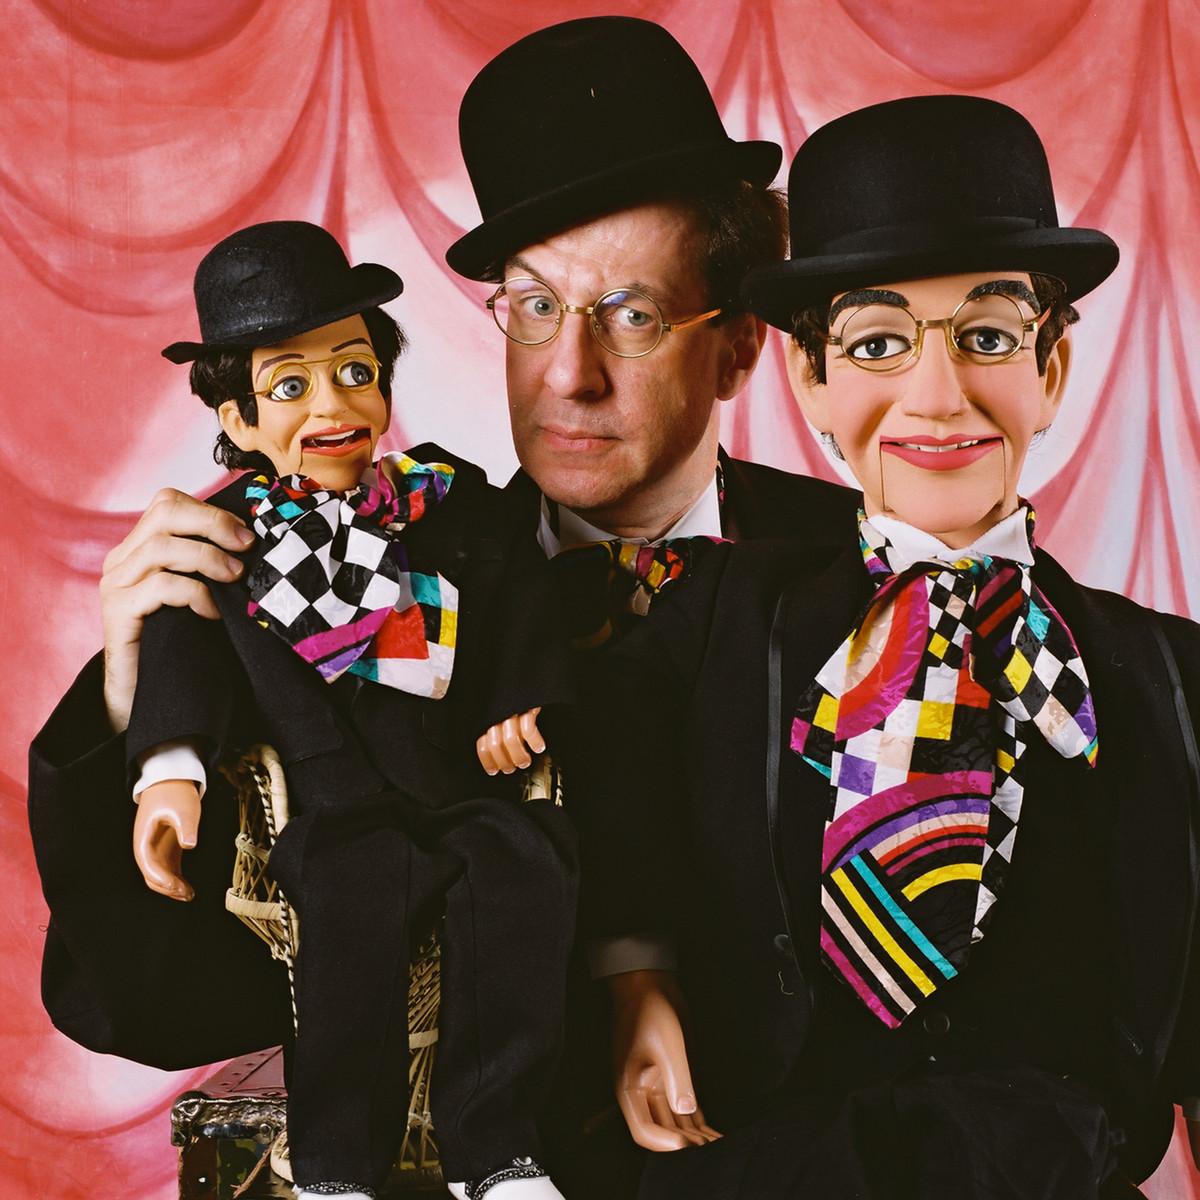 Bob Rumba with Bob and Bob